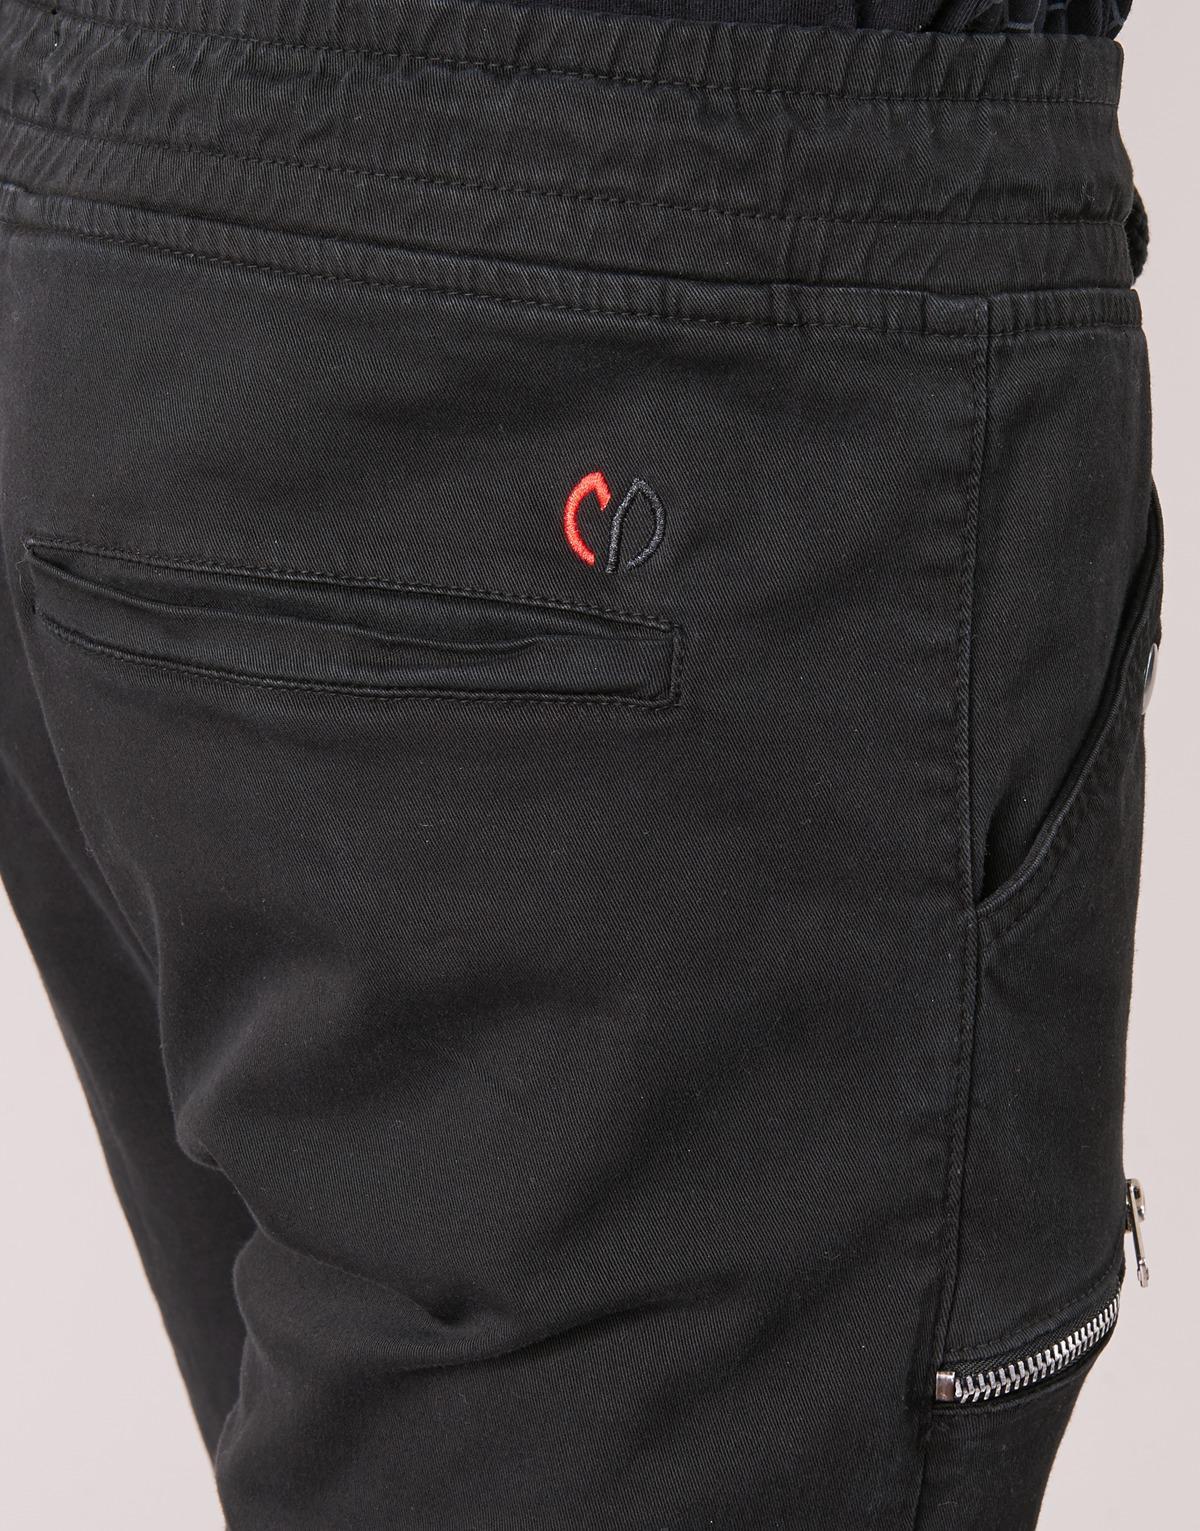 Yurban Horia Men's Trousers In Black for Men - Save 6%